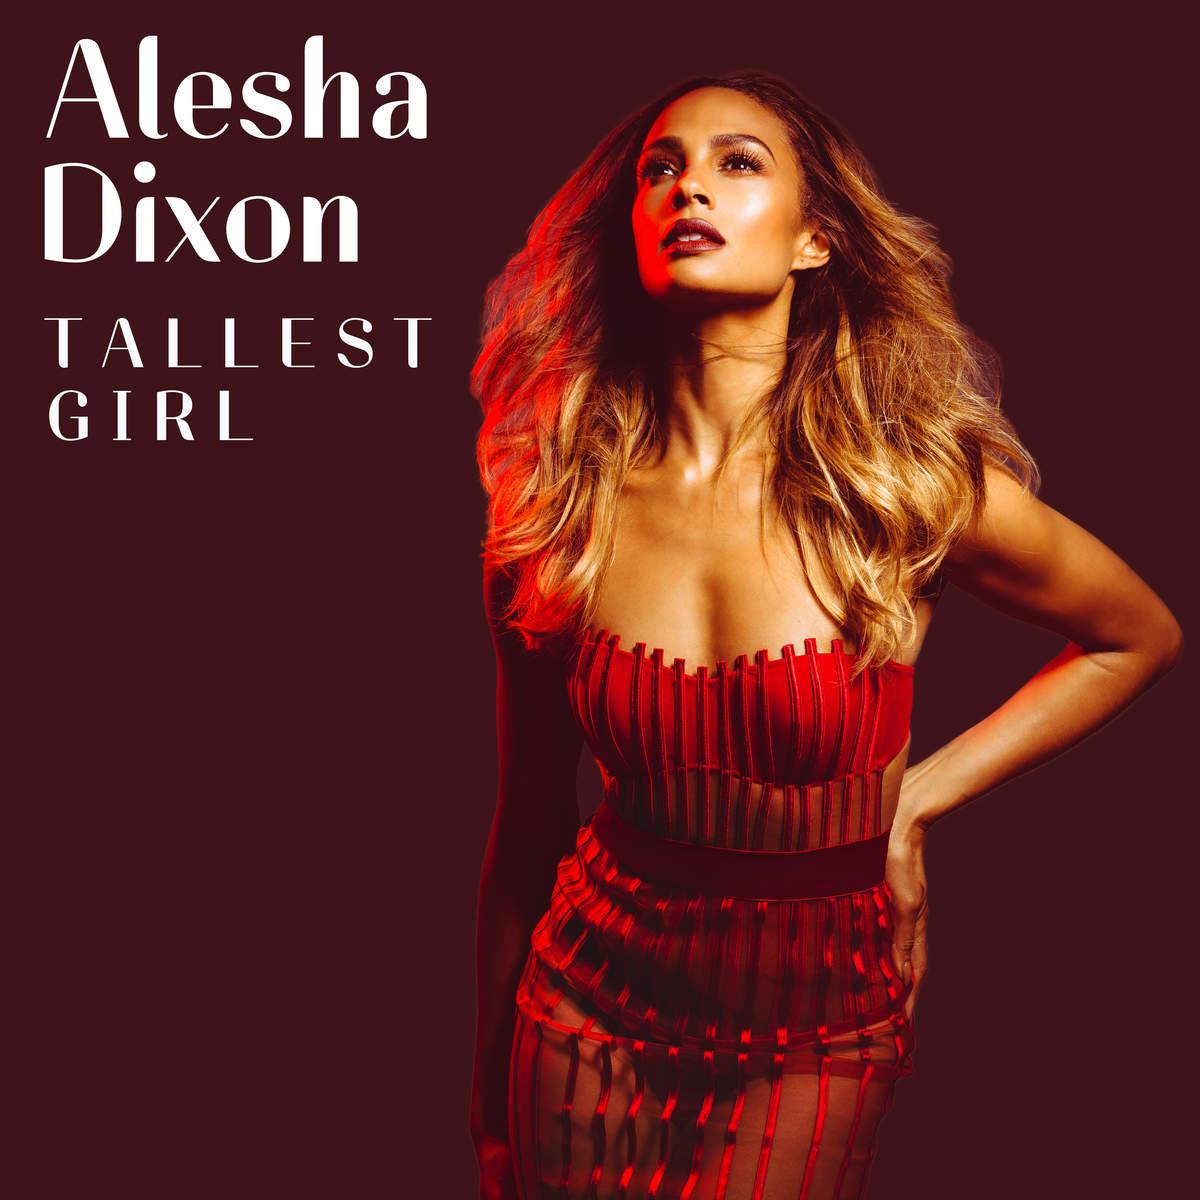 Alesha-Dixon-Tallest-Girl-single-cover-art